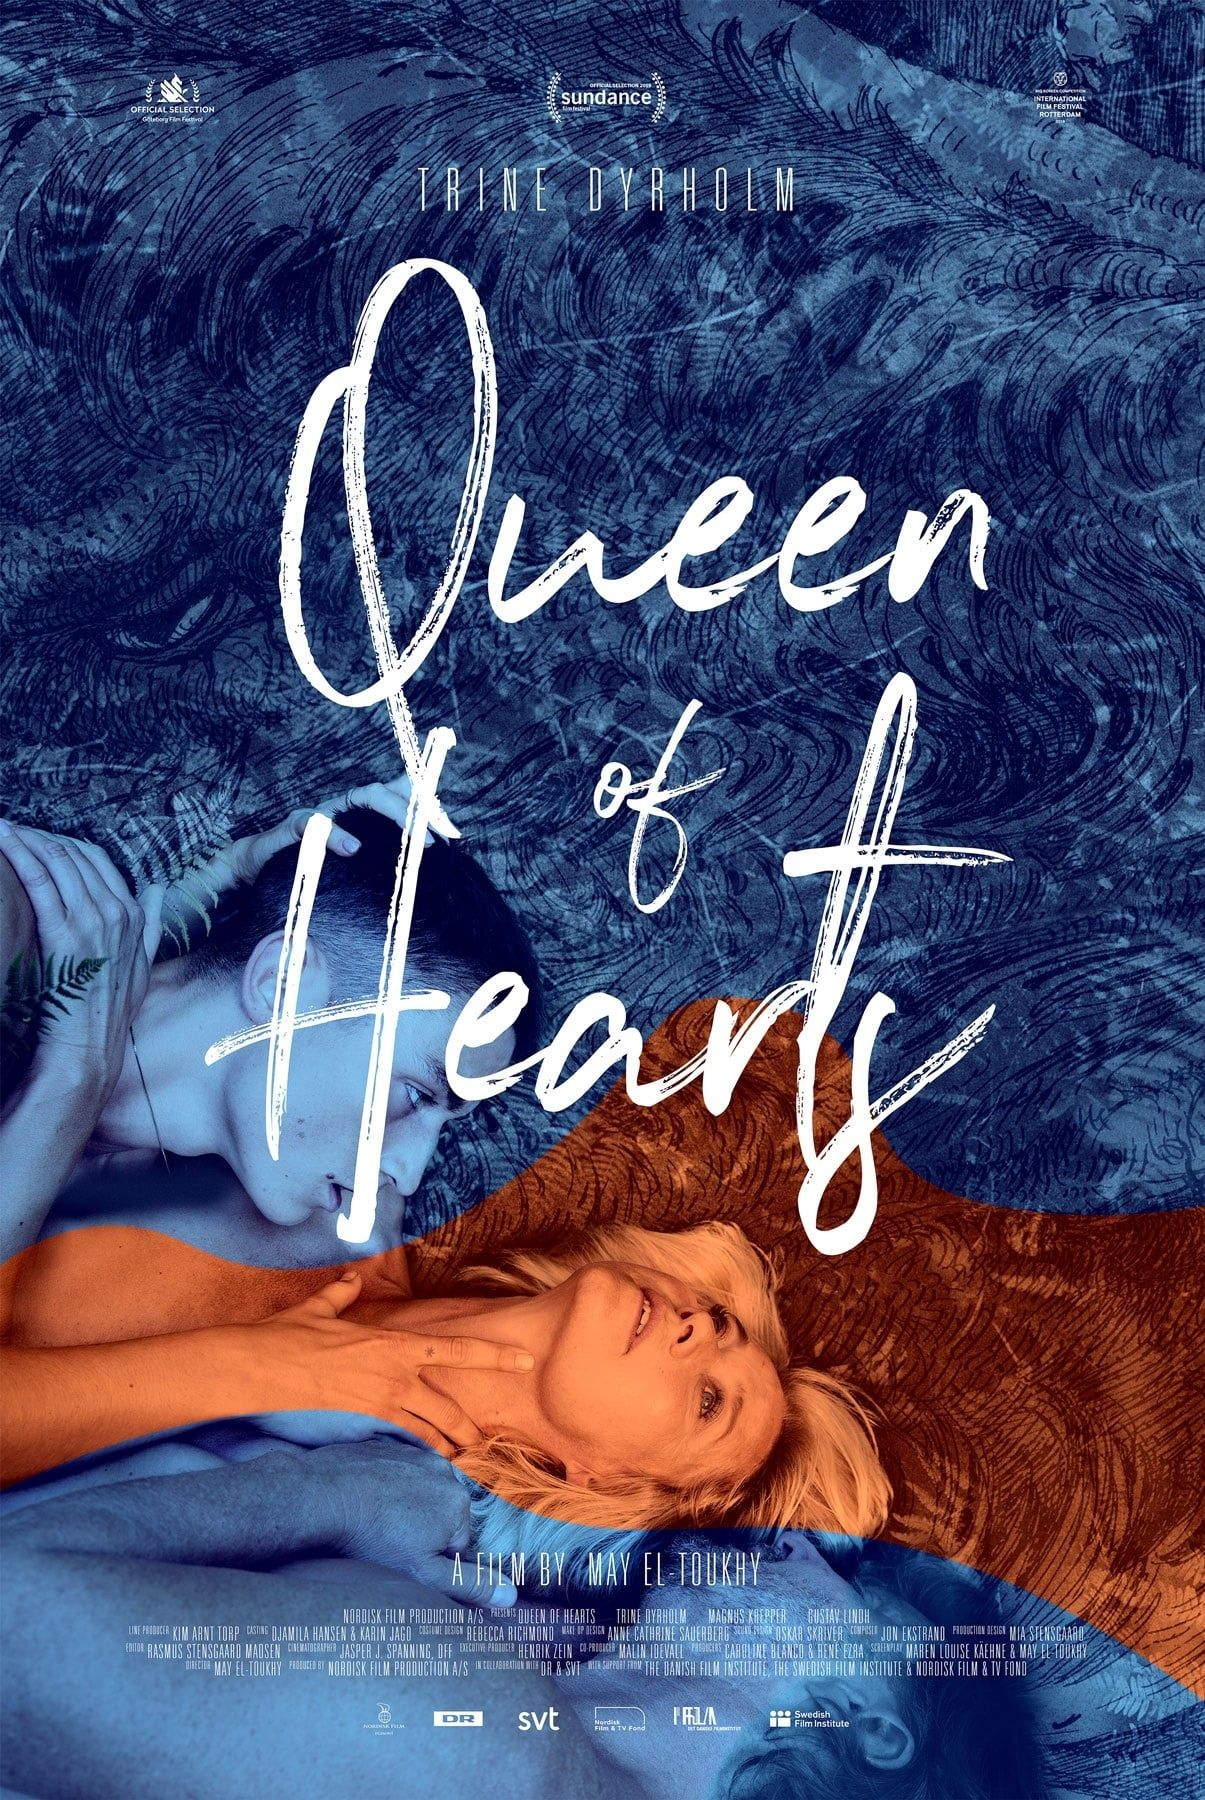 Watch Dronningen 8605 Full Movie Dronningen Fullmovie Film Complet Peliculas Online Stream Streaming T Full Movies Queen Of Hearts Online Streaming